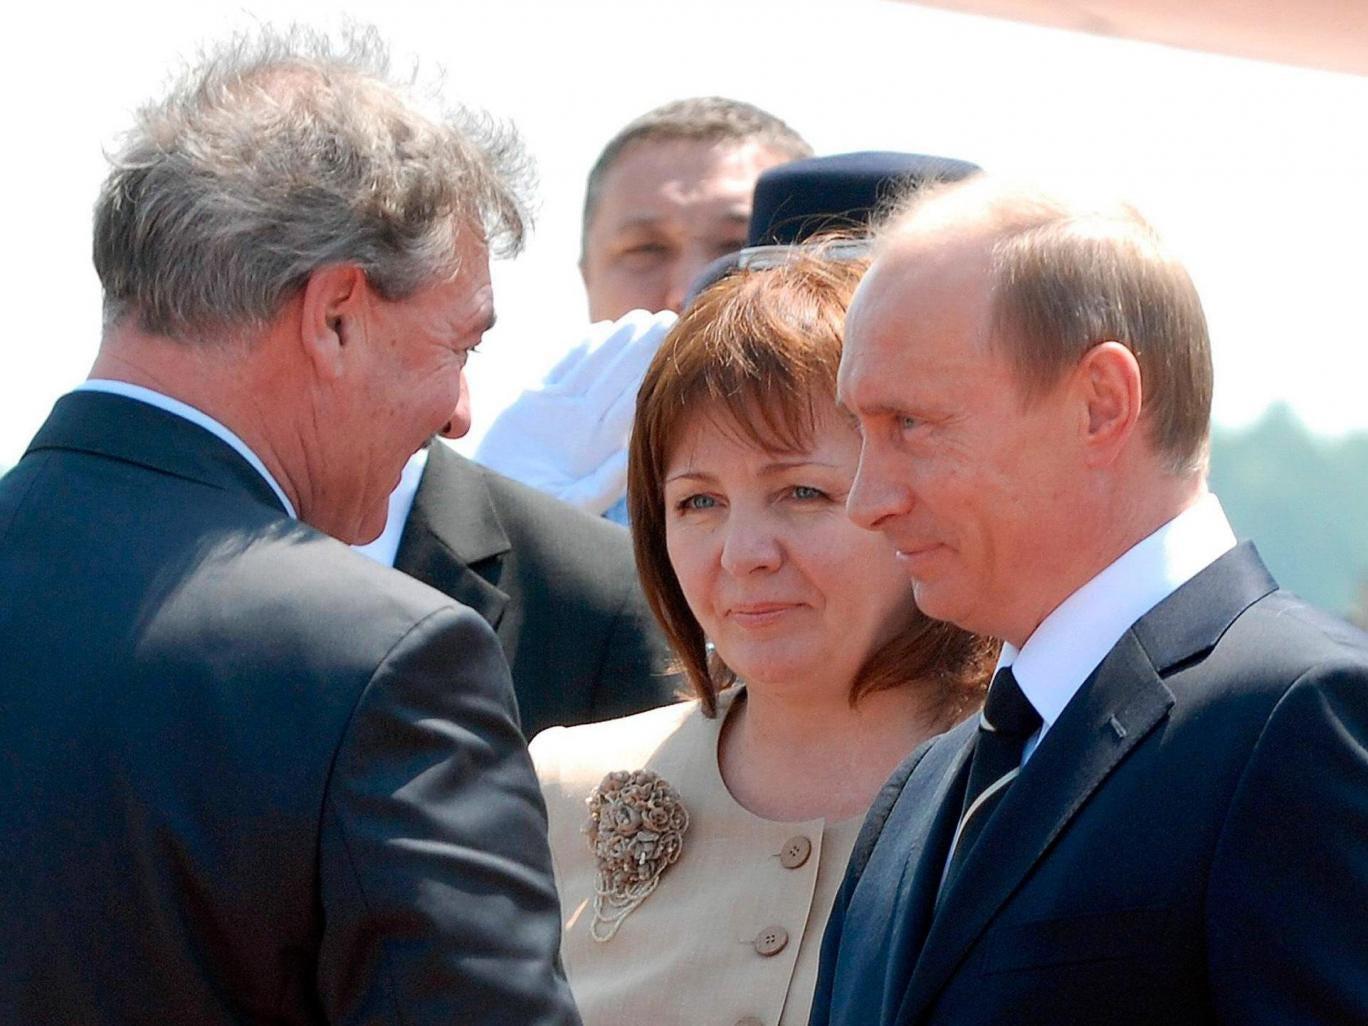 Lyudmila Porgina told how her husband feels 19.07.2018 6